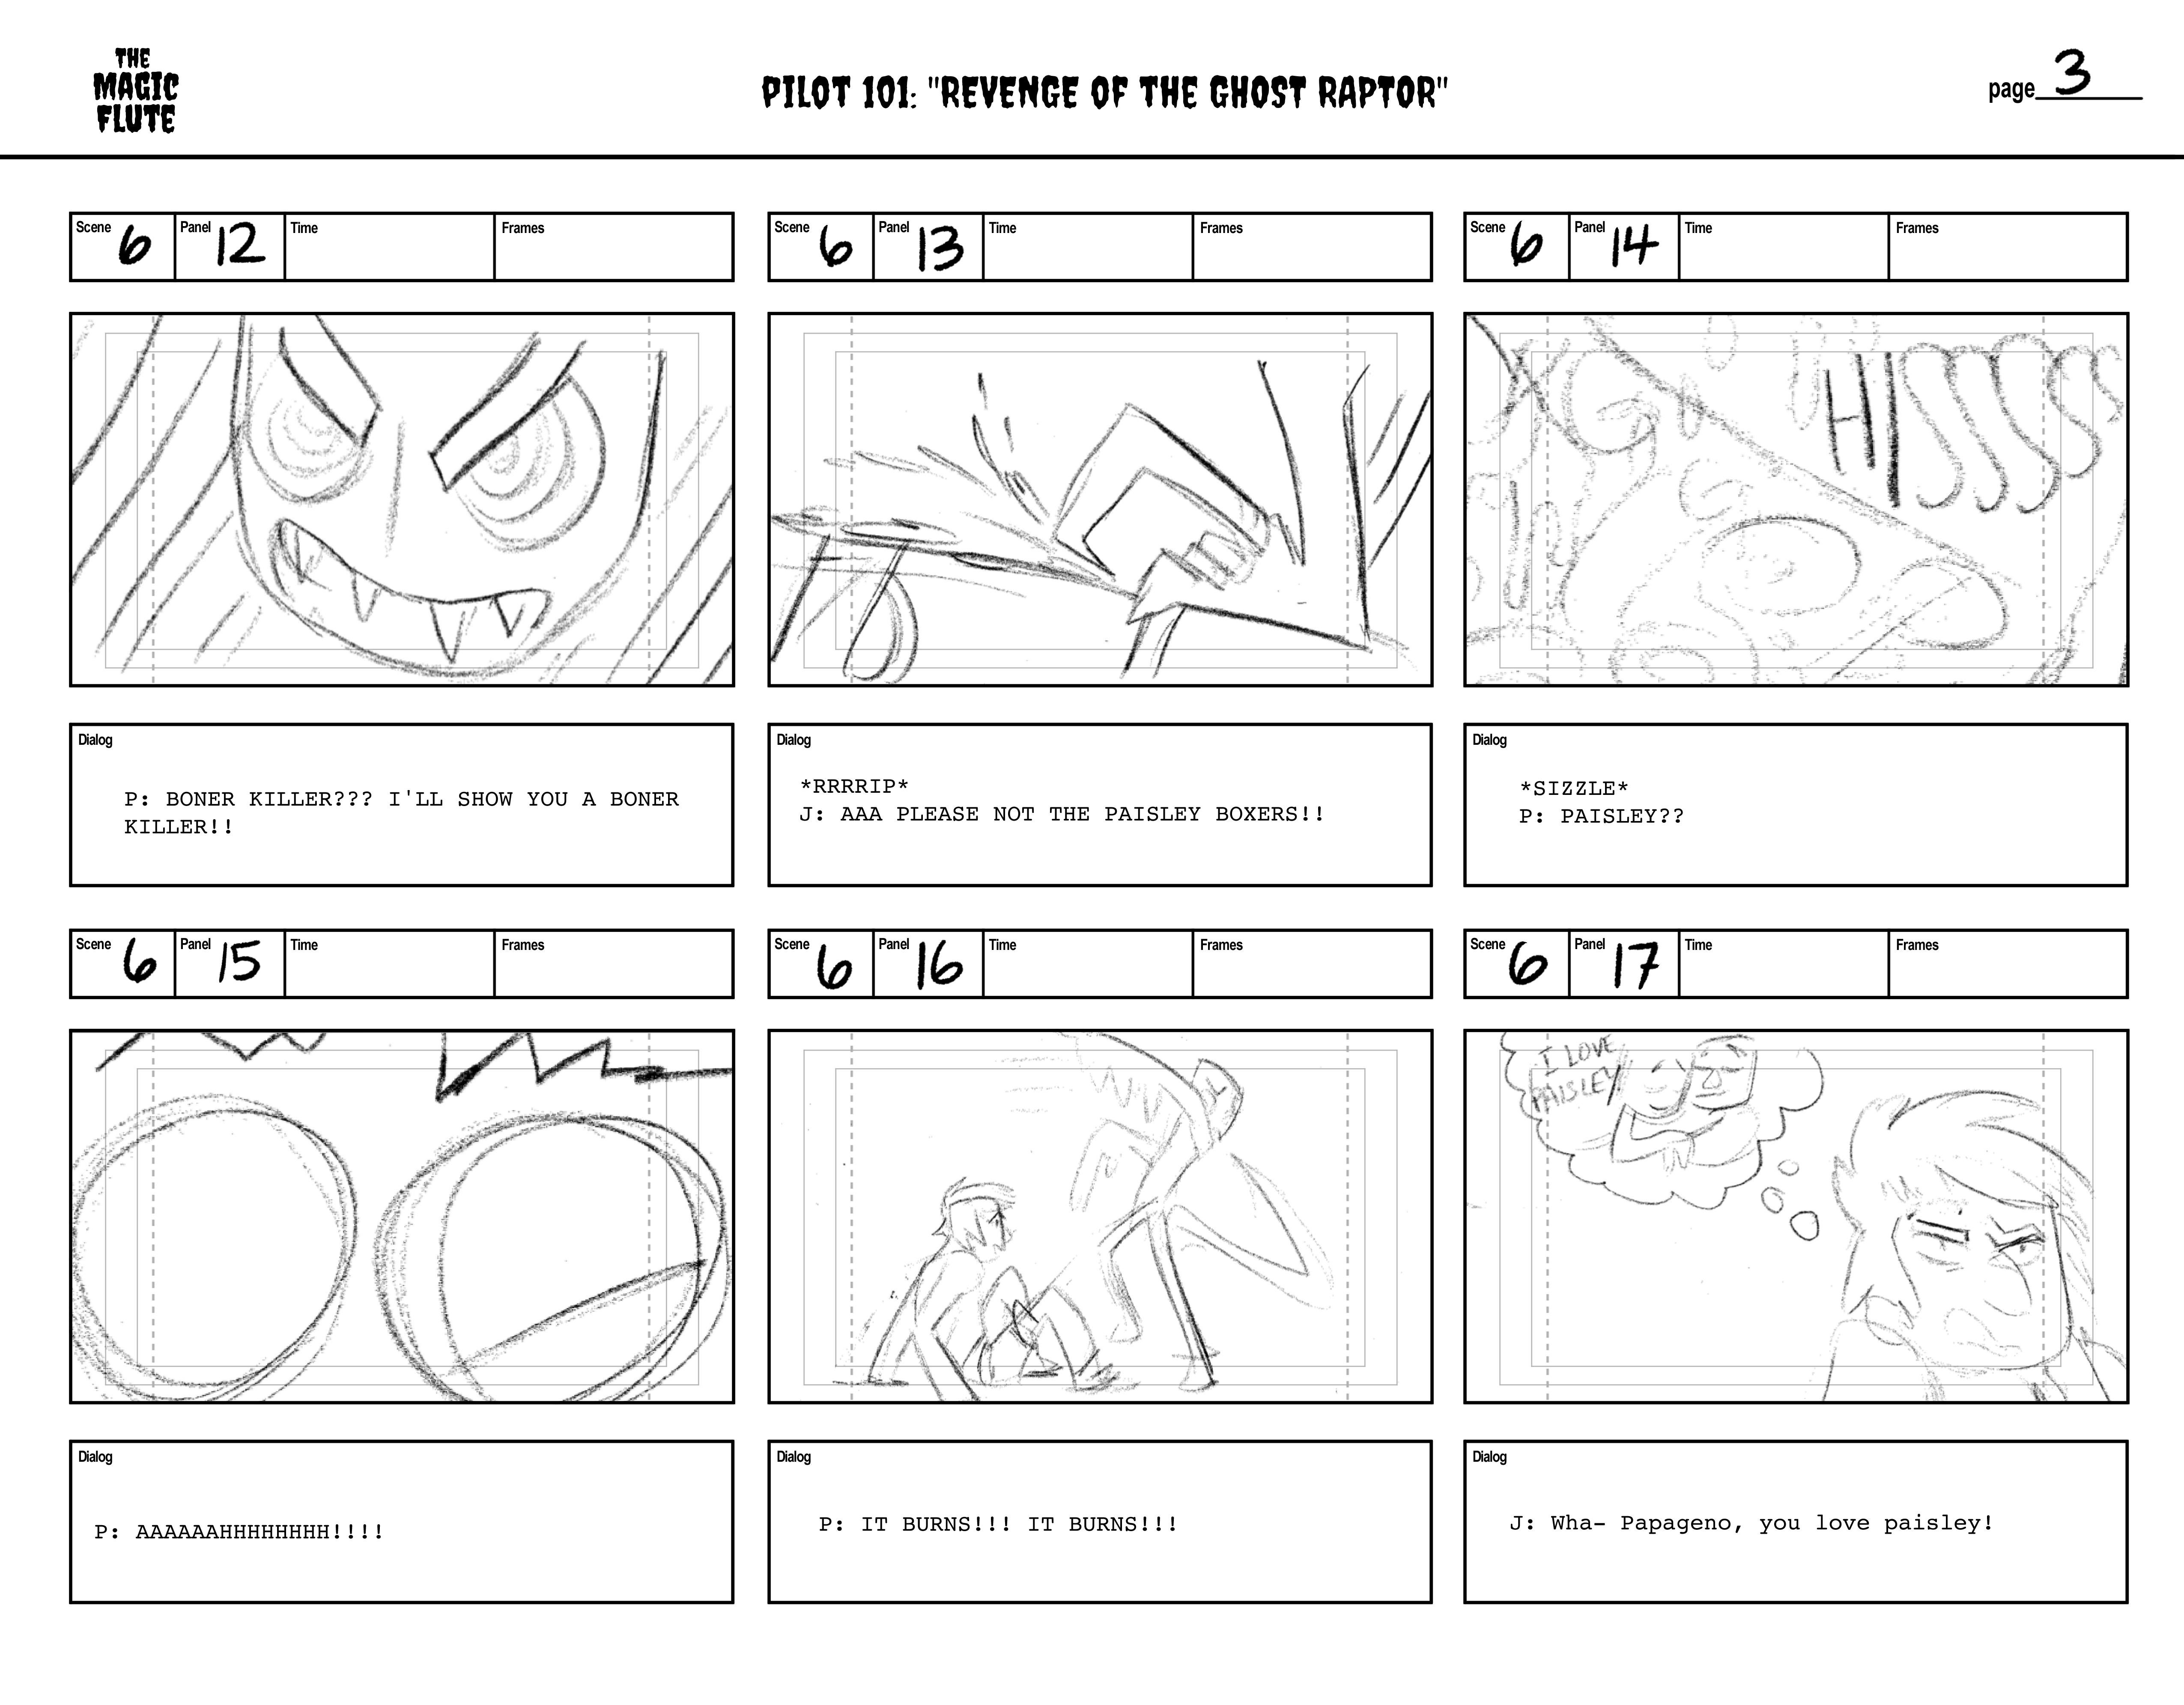 Storyboards 13-18